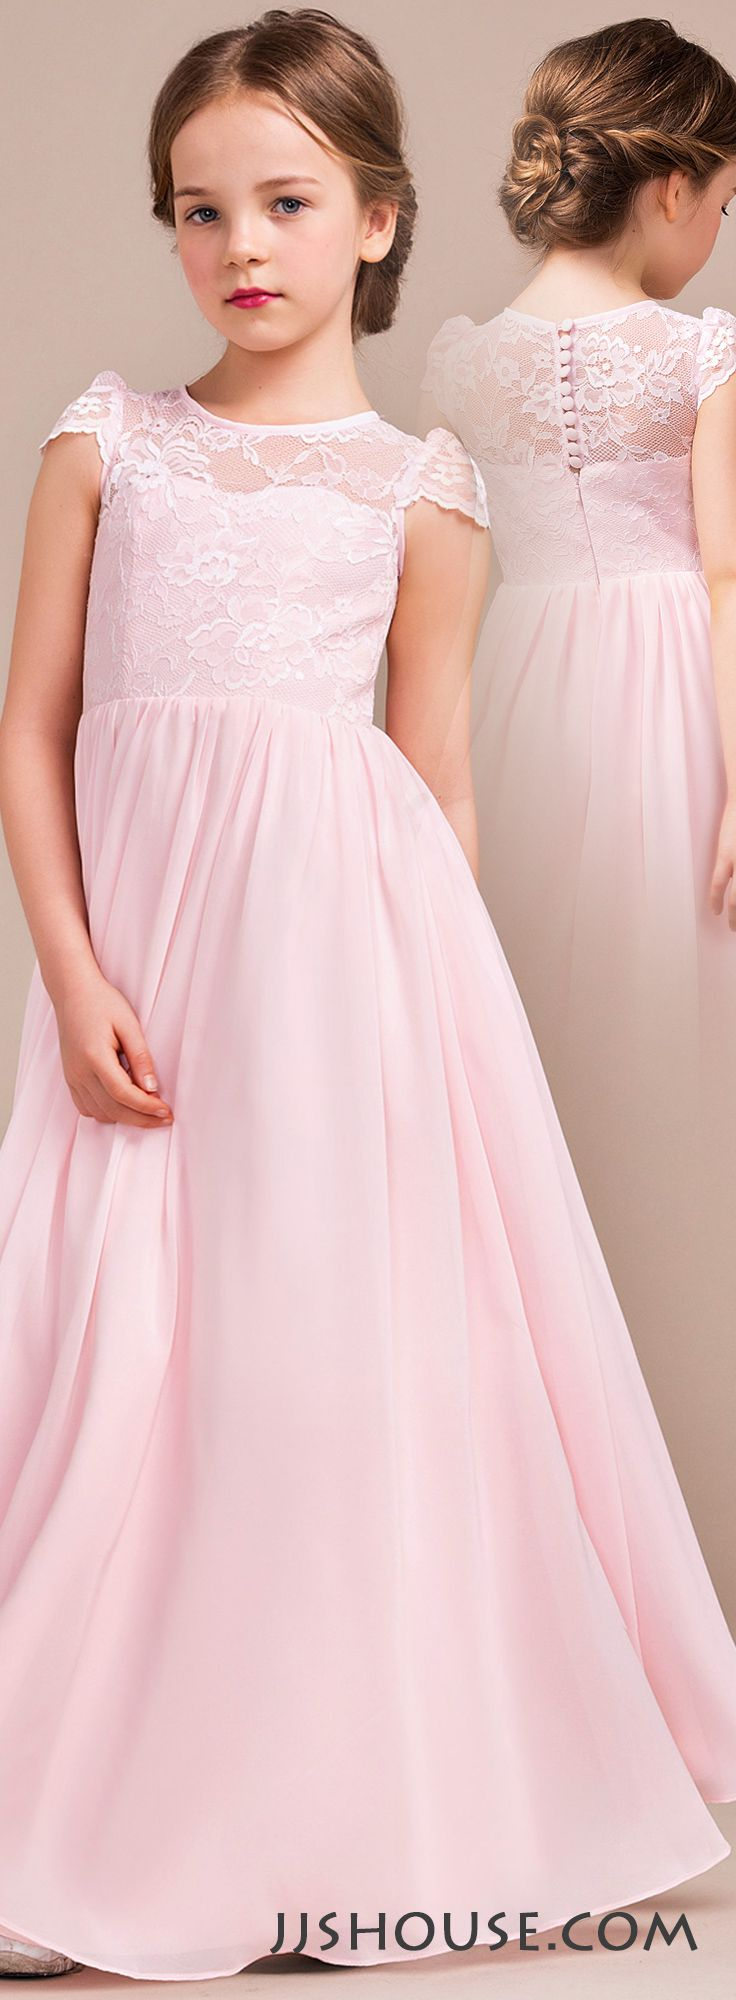 Best 25+ Junior bridesmaids ideas on Pinterest | Junior ...